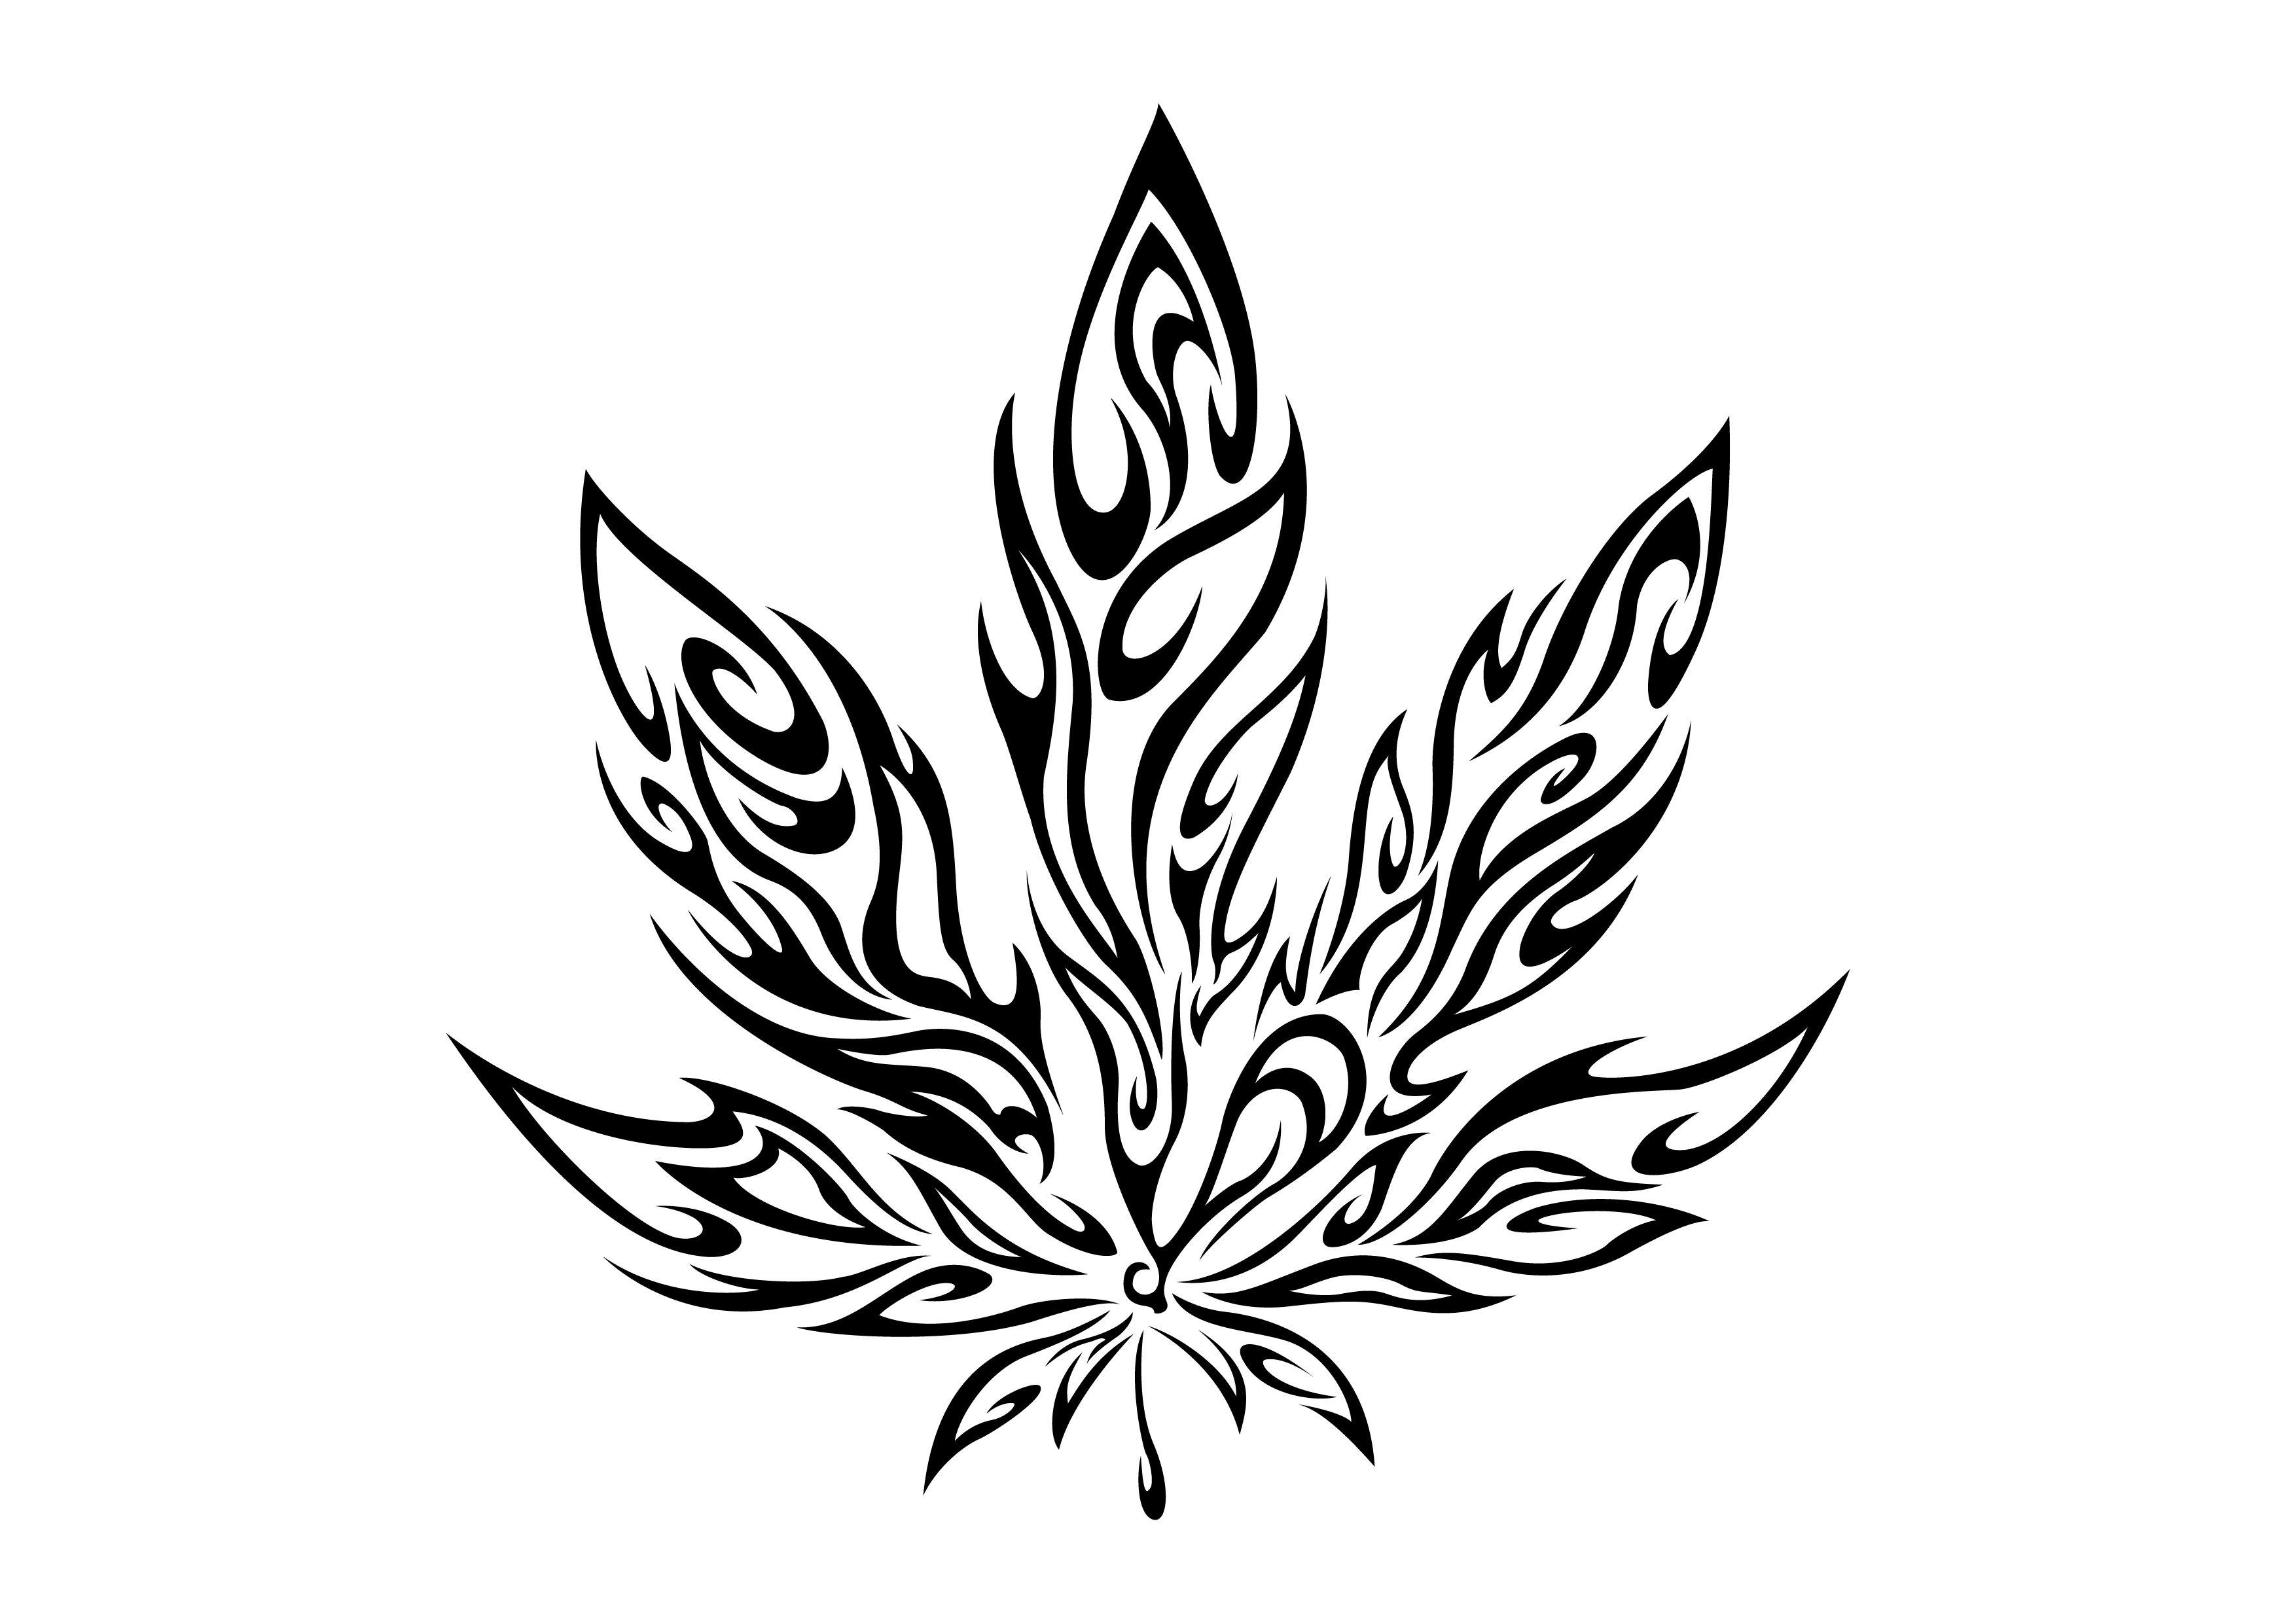 SMOKING POT LEAF ~ New! - $10.00 : Airbrush Stencils Store, Air ...